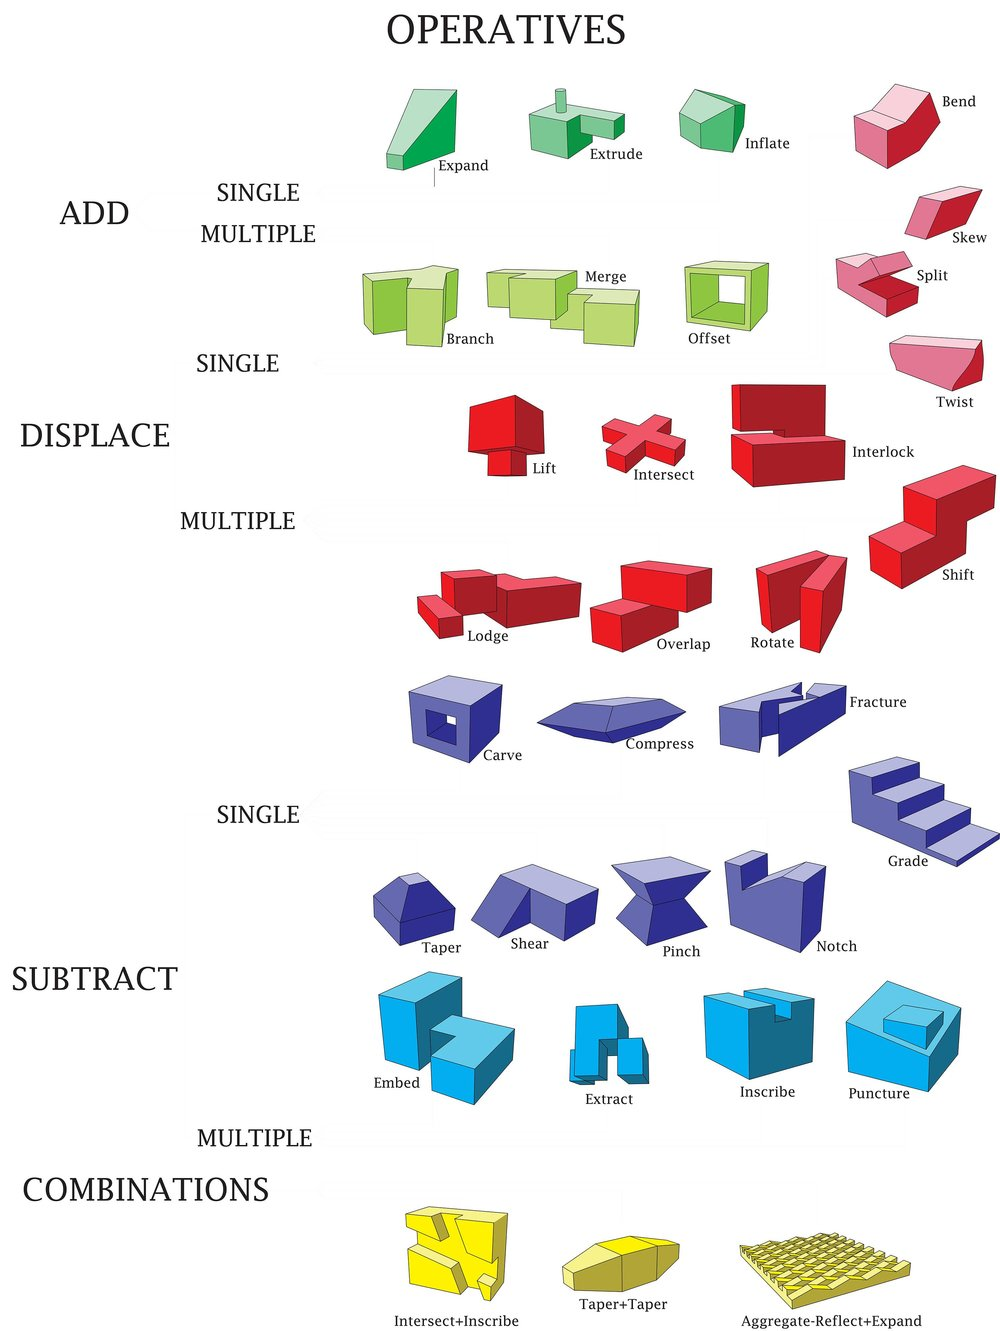 1_OperativeDesign.jpg